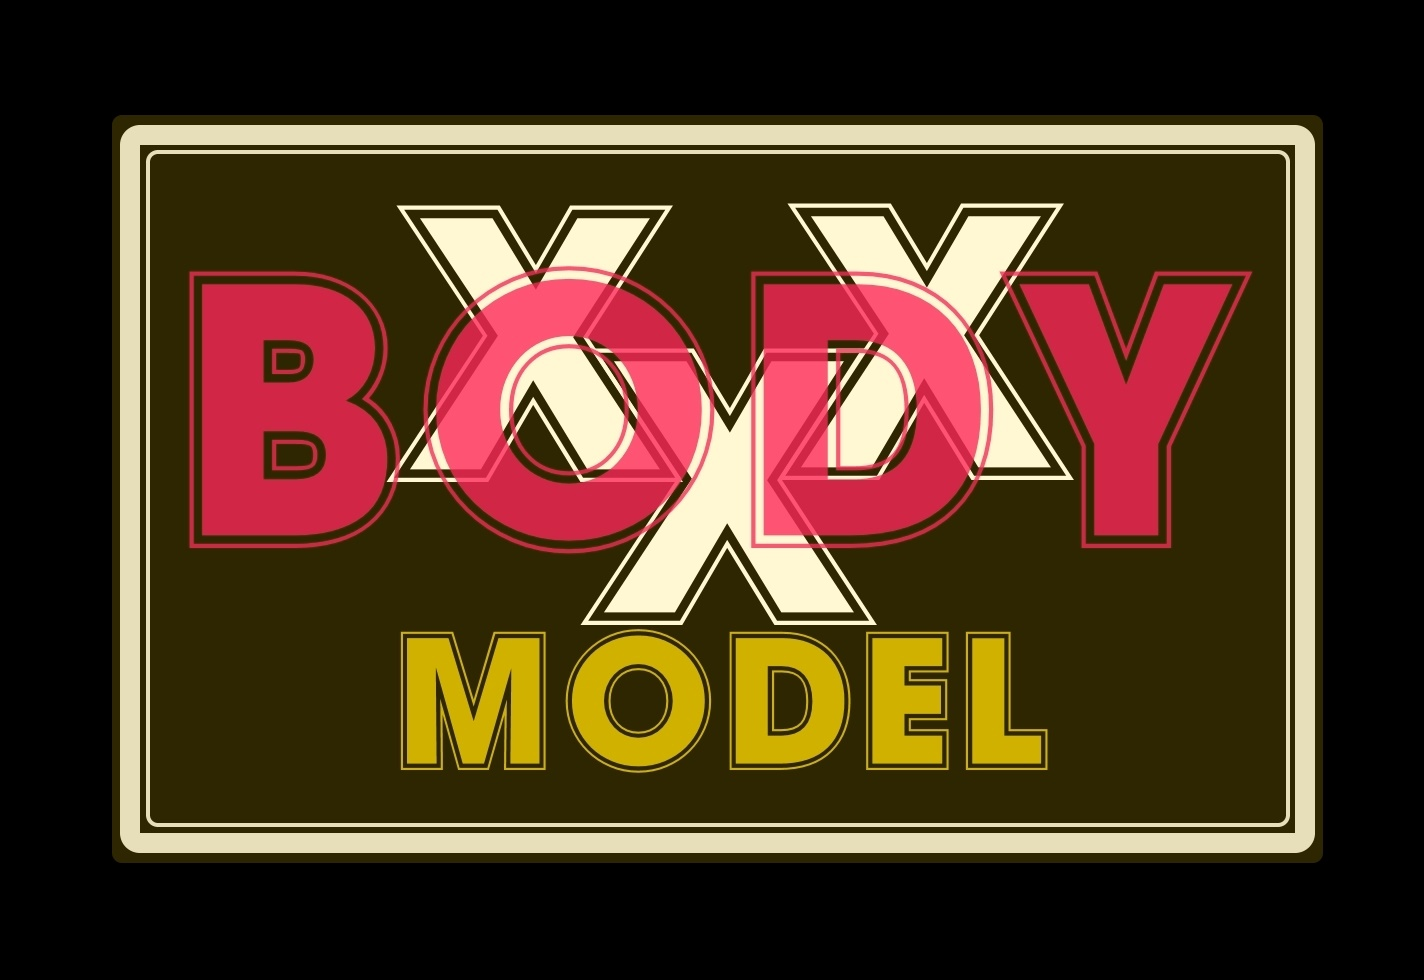 Разработка логотипа (видеоблог для моделей) фото f_2405b23f2f7787e1.jpg